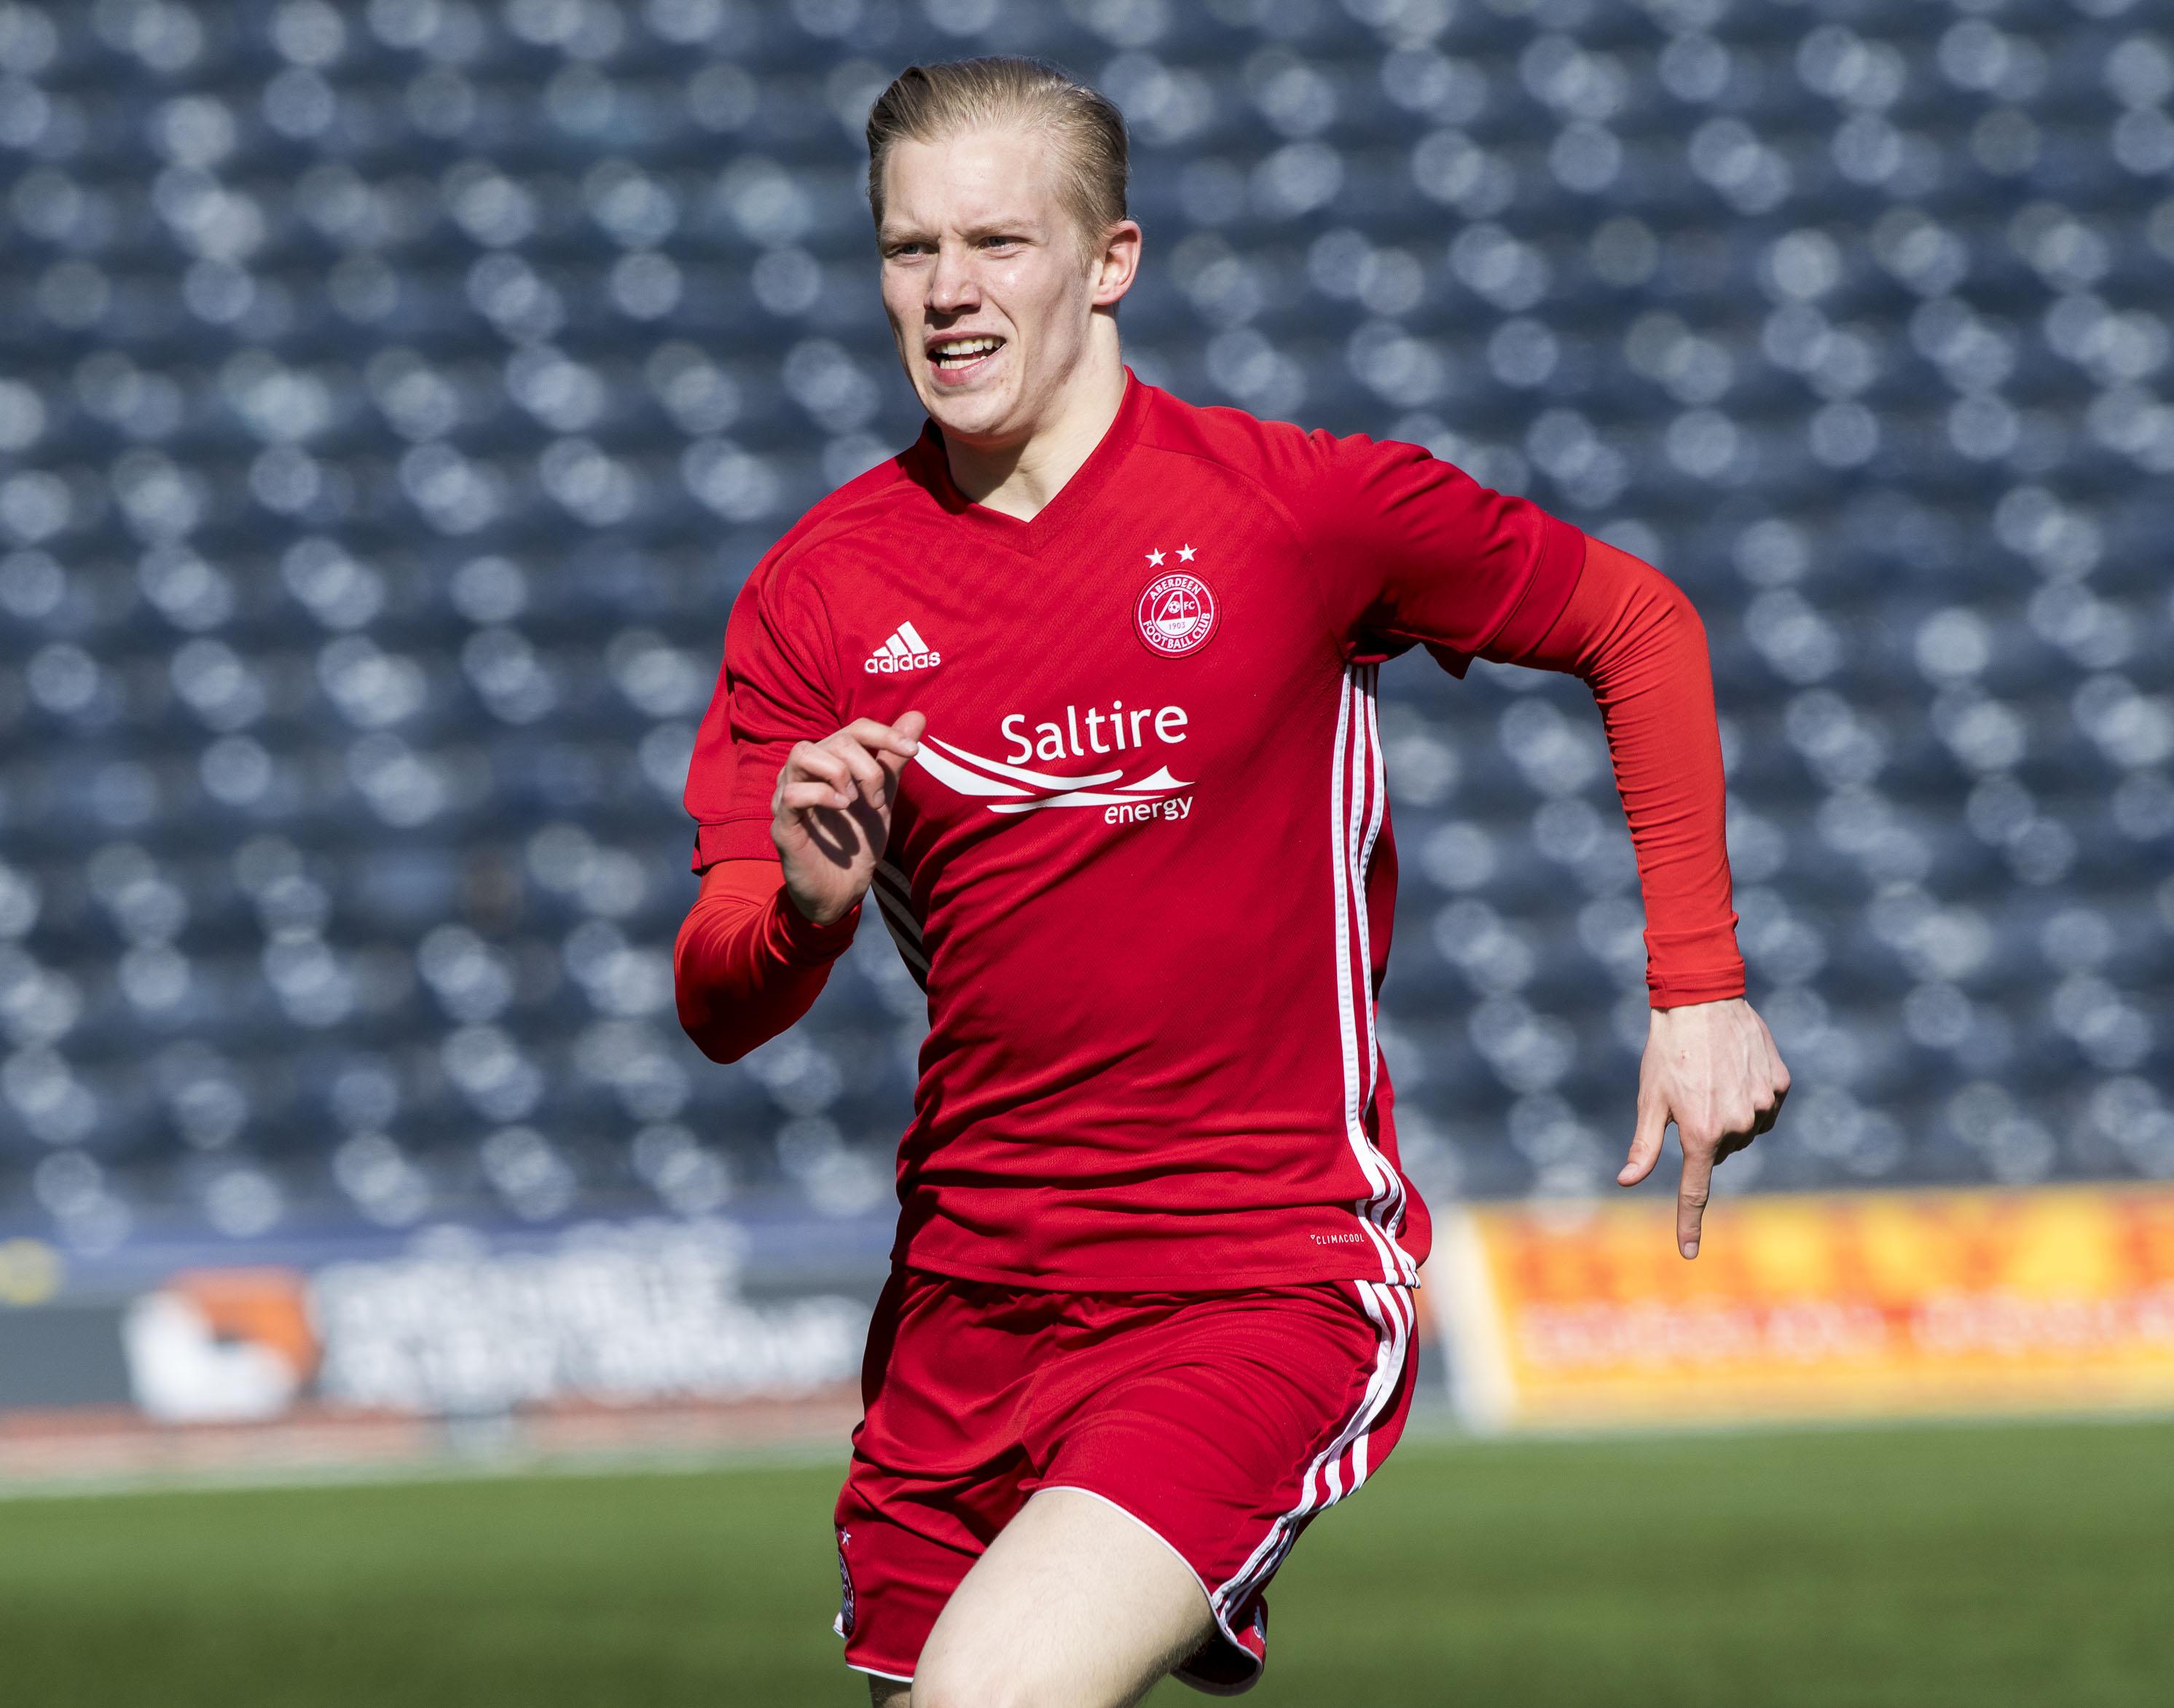 Miko Virtanen in action for Aberdeen